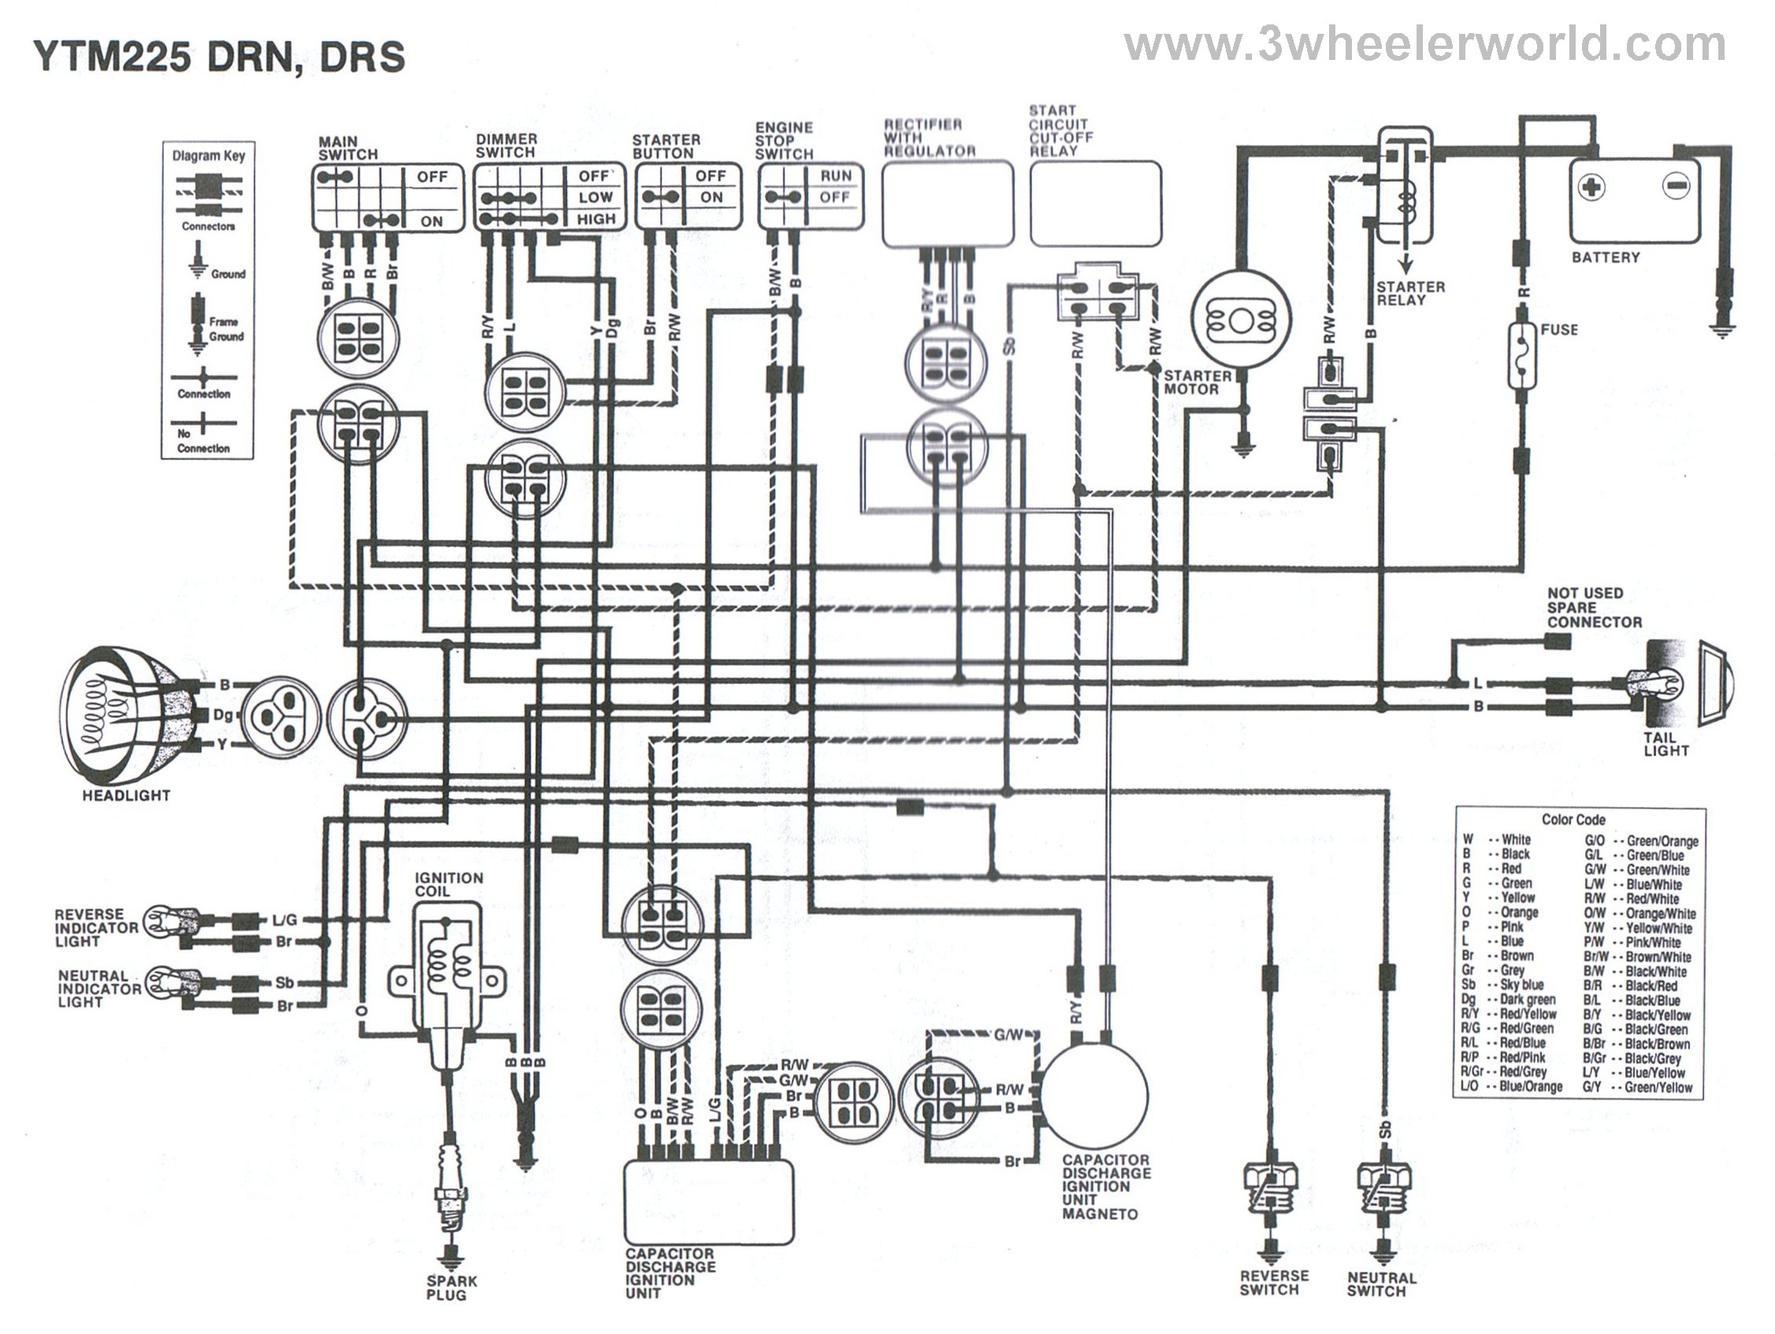 attachment Raptor Wire Harness Diagram on craigslist omaha, clutch assemblies, air filter, quad wheelie, reverse handle, ford truck, race ready, atv performance parts,